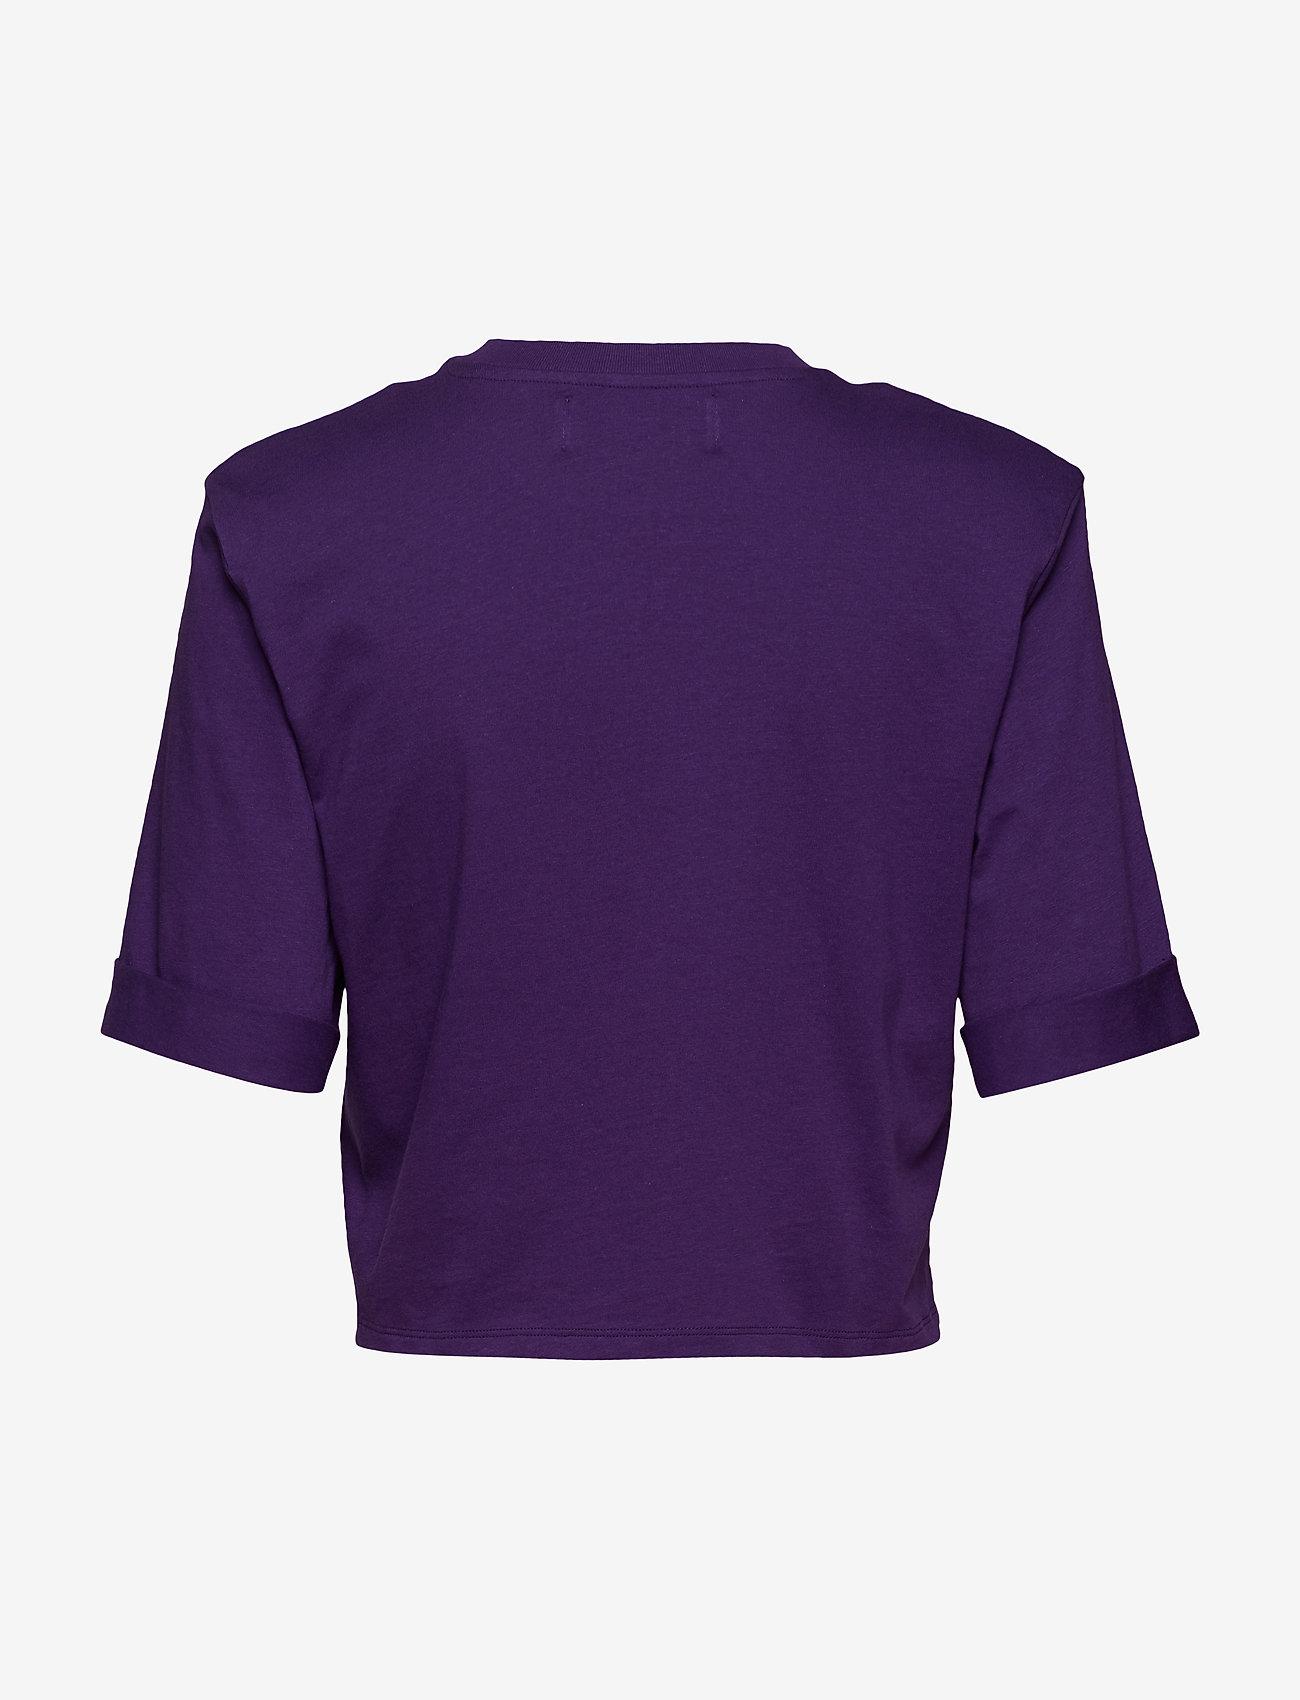 Ivyrevel - CROPPED IVY TSHIRT - crop tops - purple